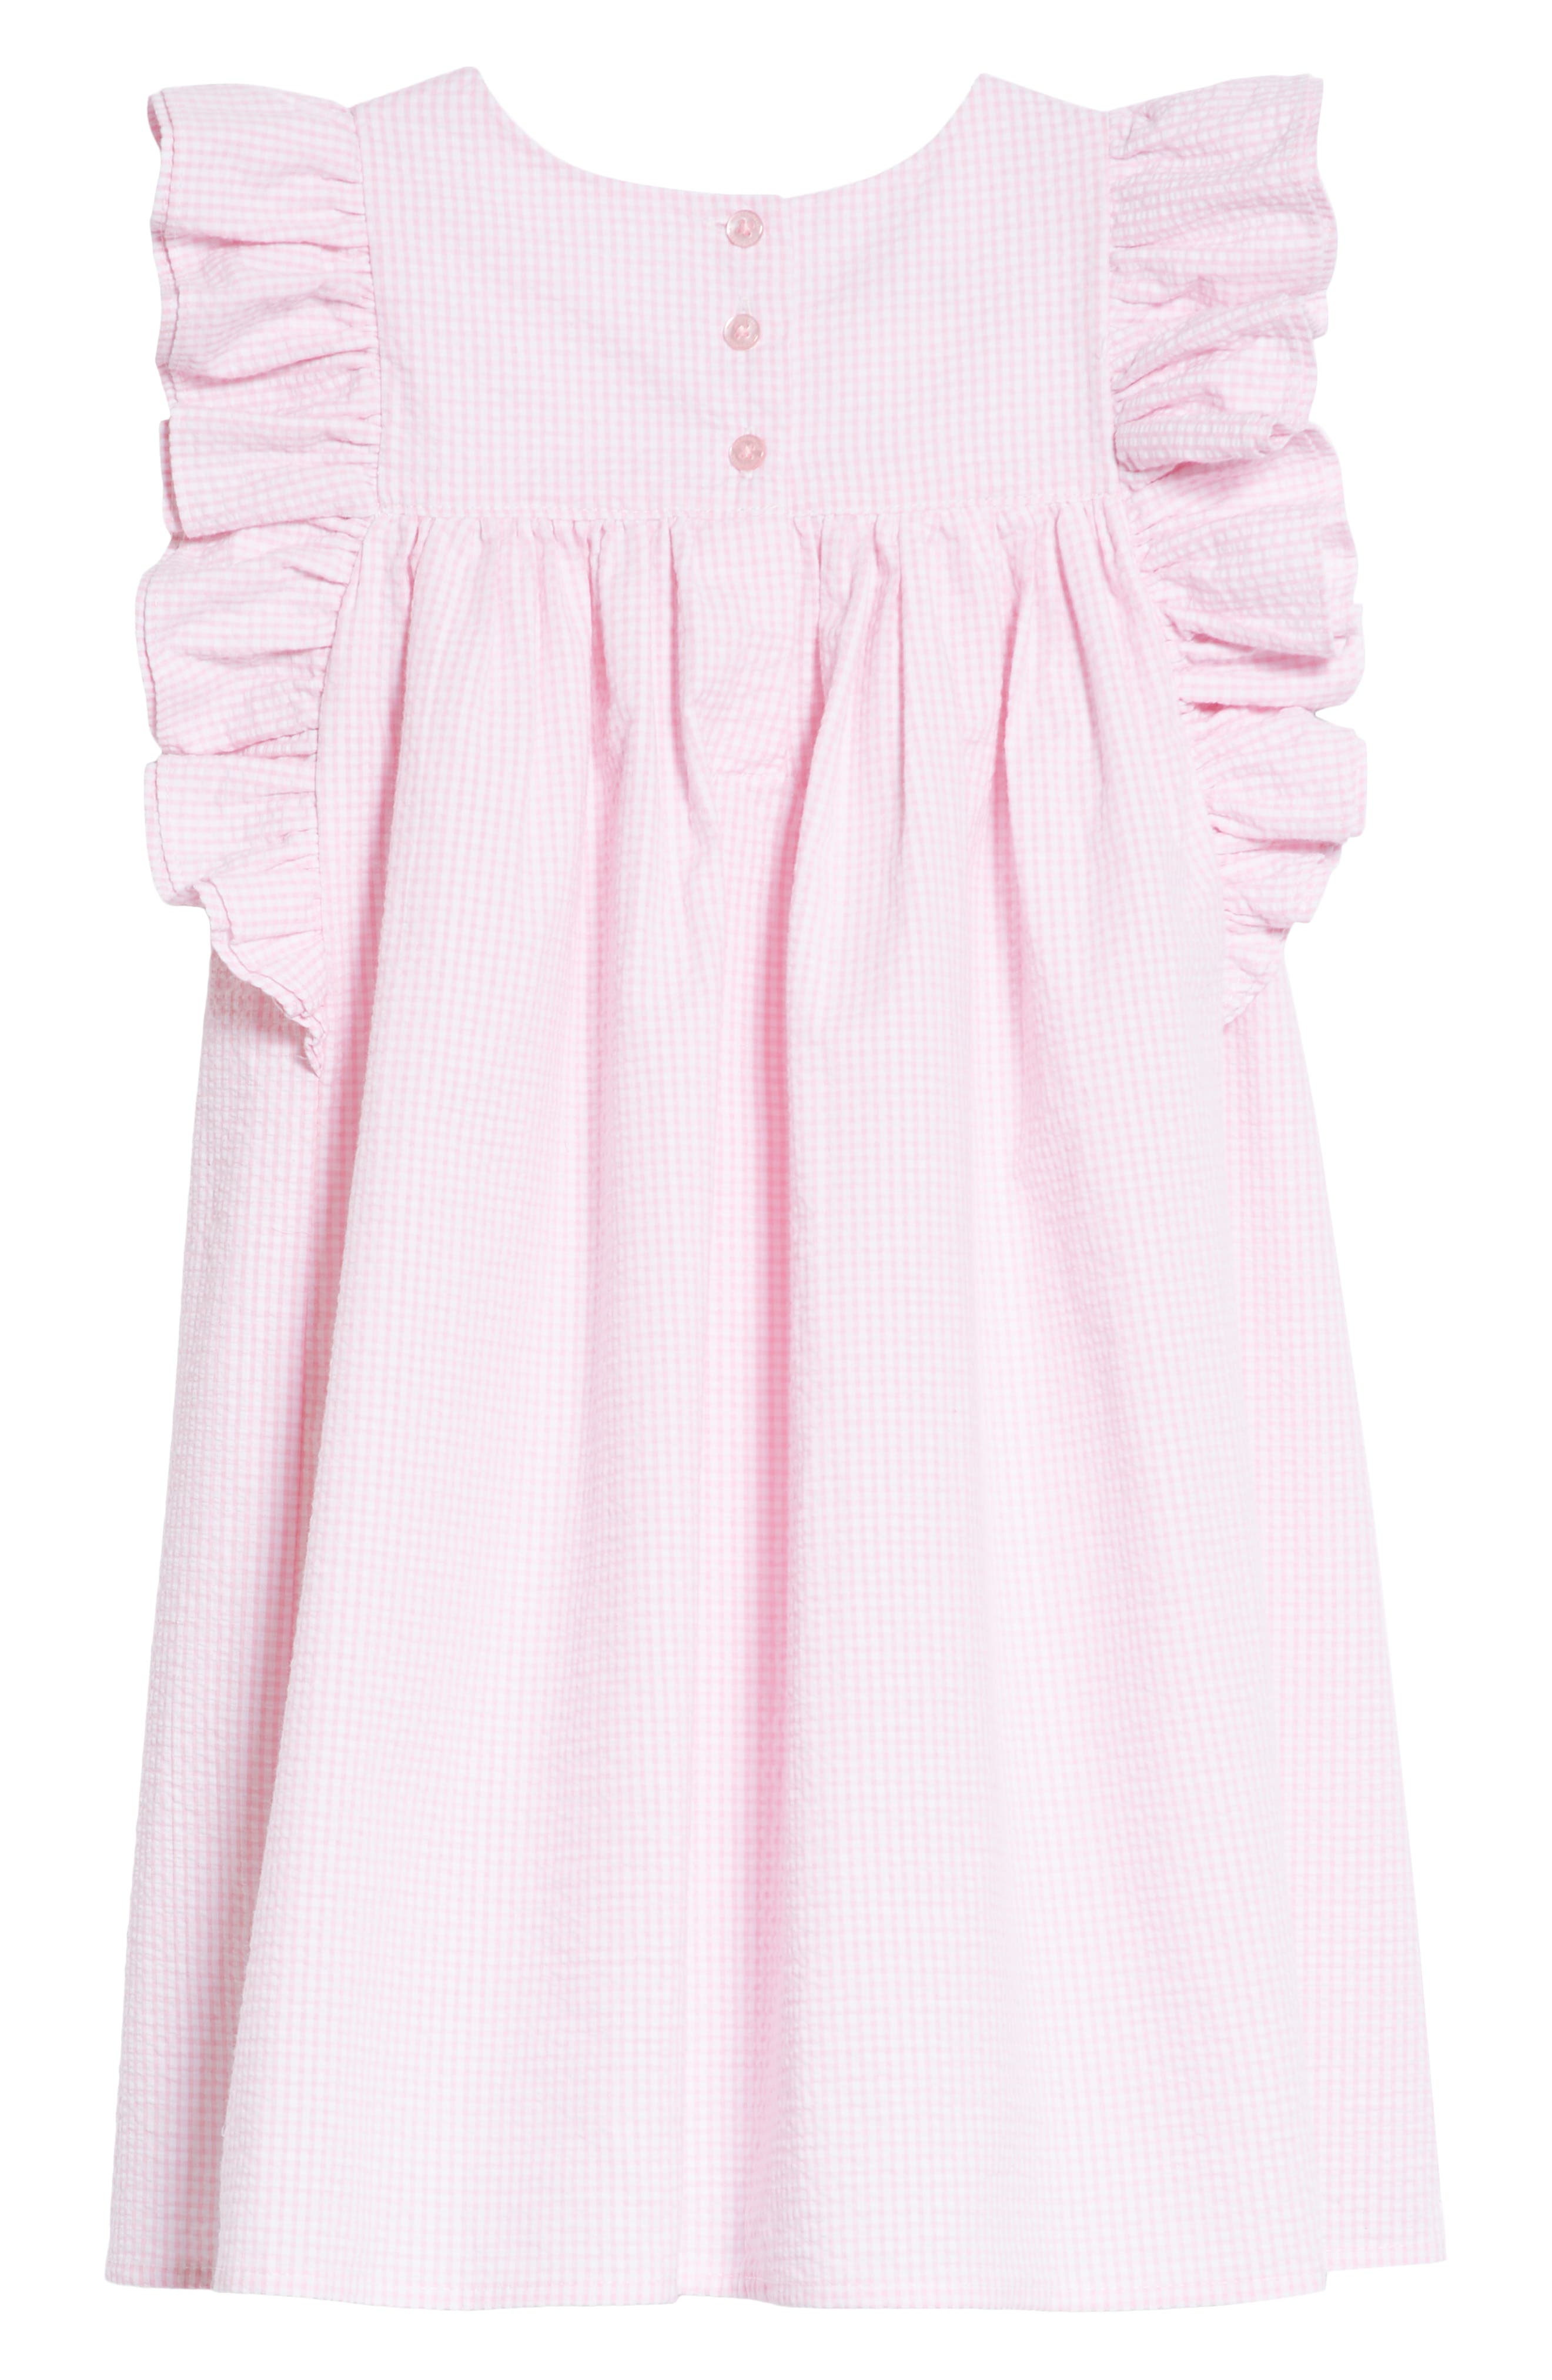 Seersucker Ruffle Sleeve Dress,                             Alternate thumbnail 2, color,                             Pink/ White